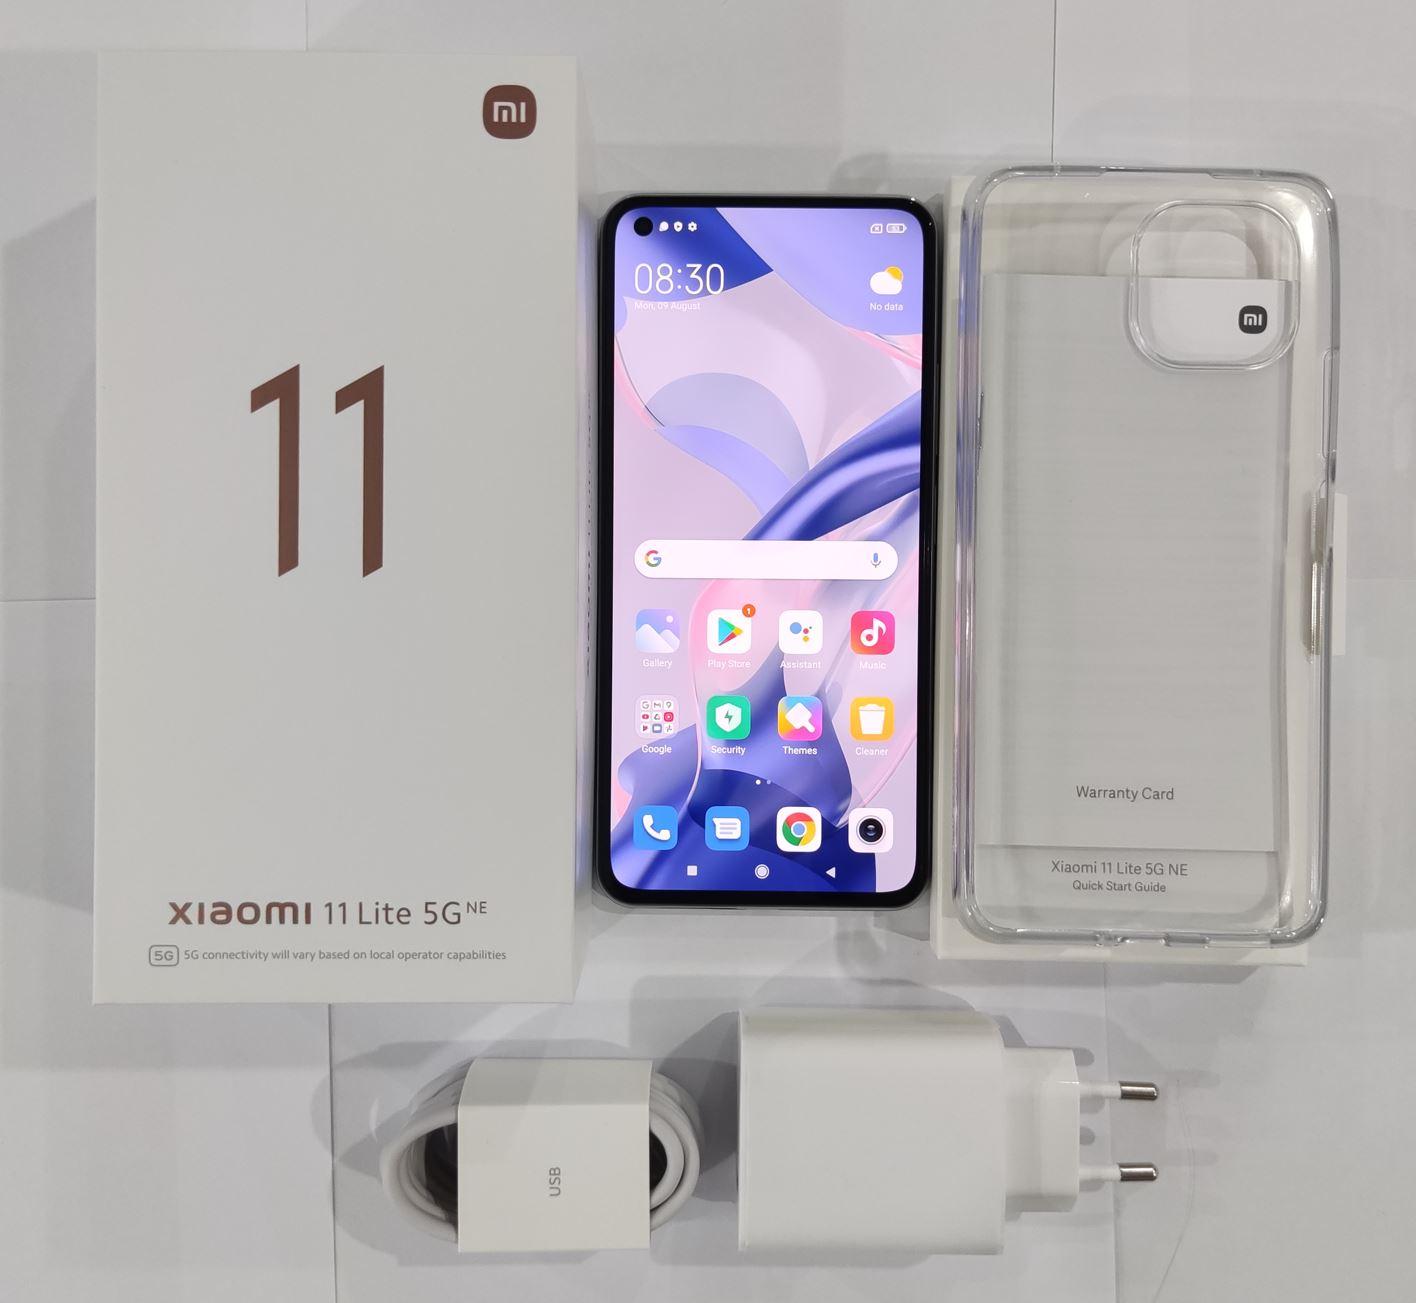 Xiaomi 11 Lite 5G NE - unboxing